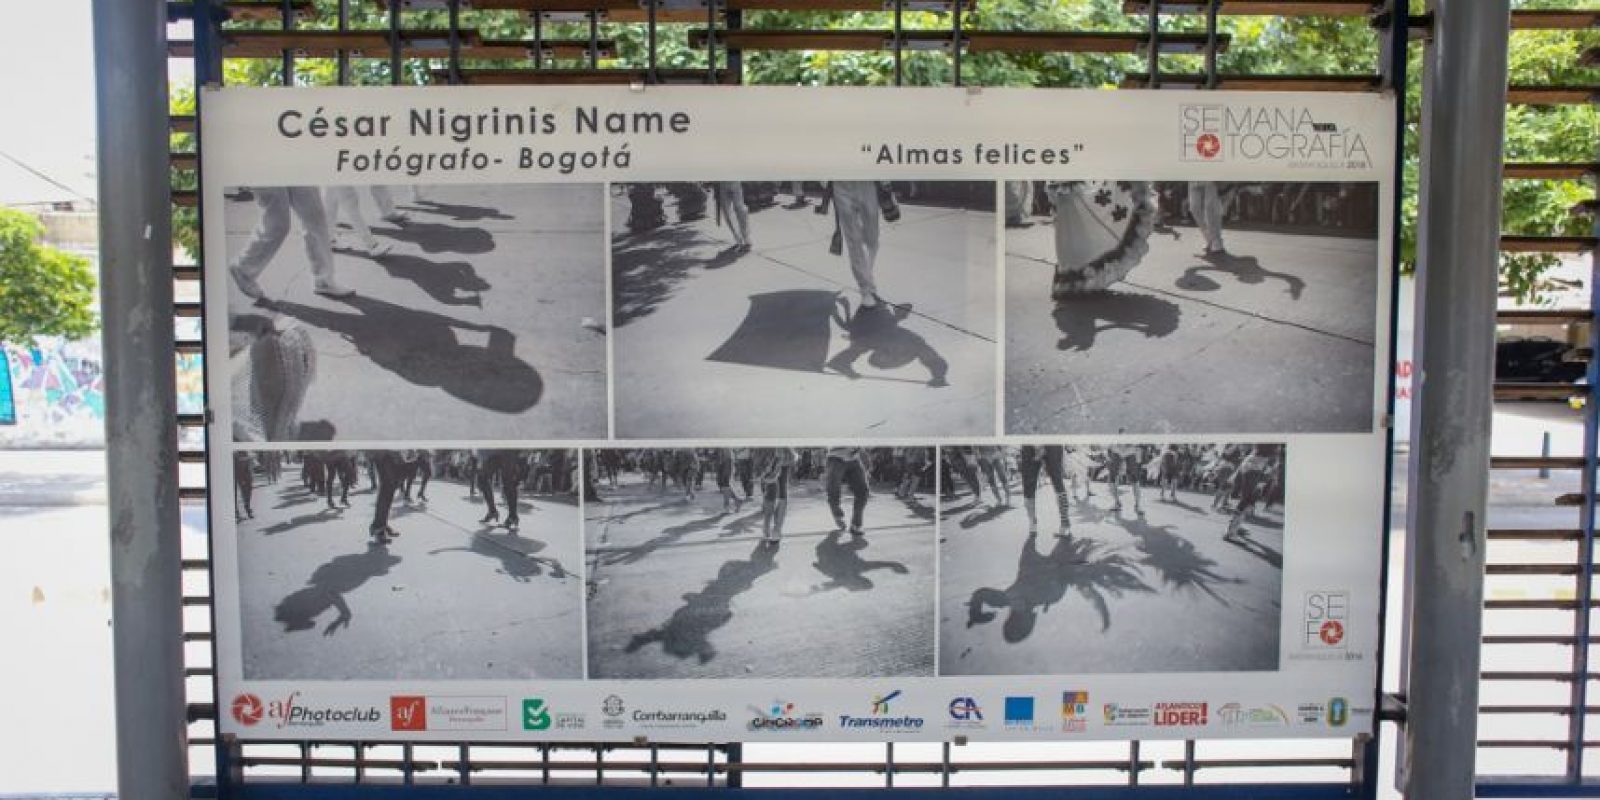 Foto:César Negrinis Name